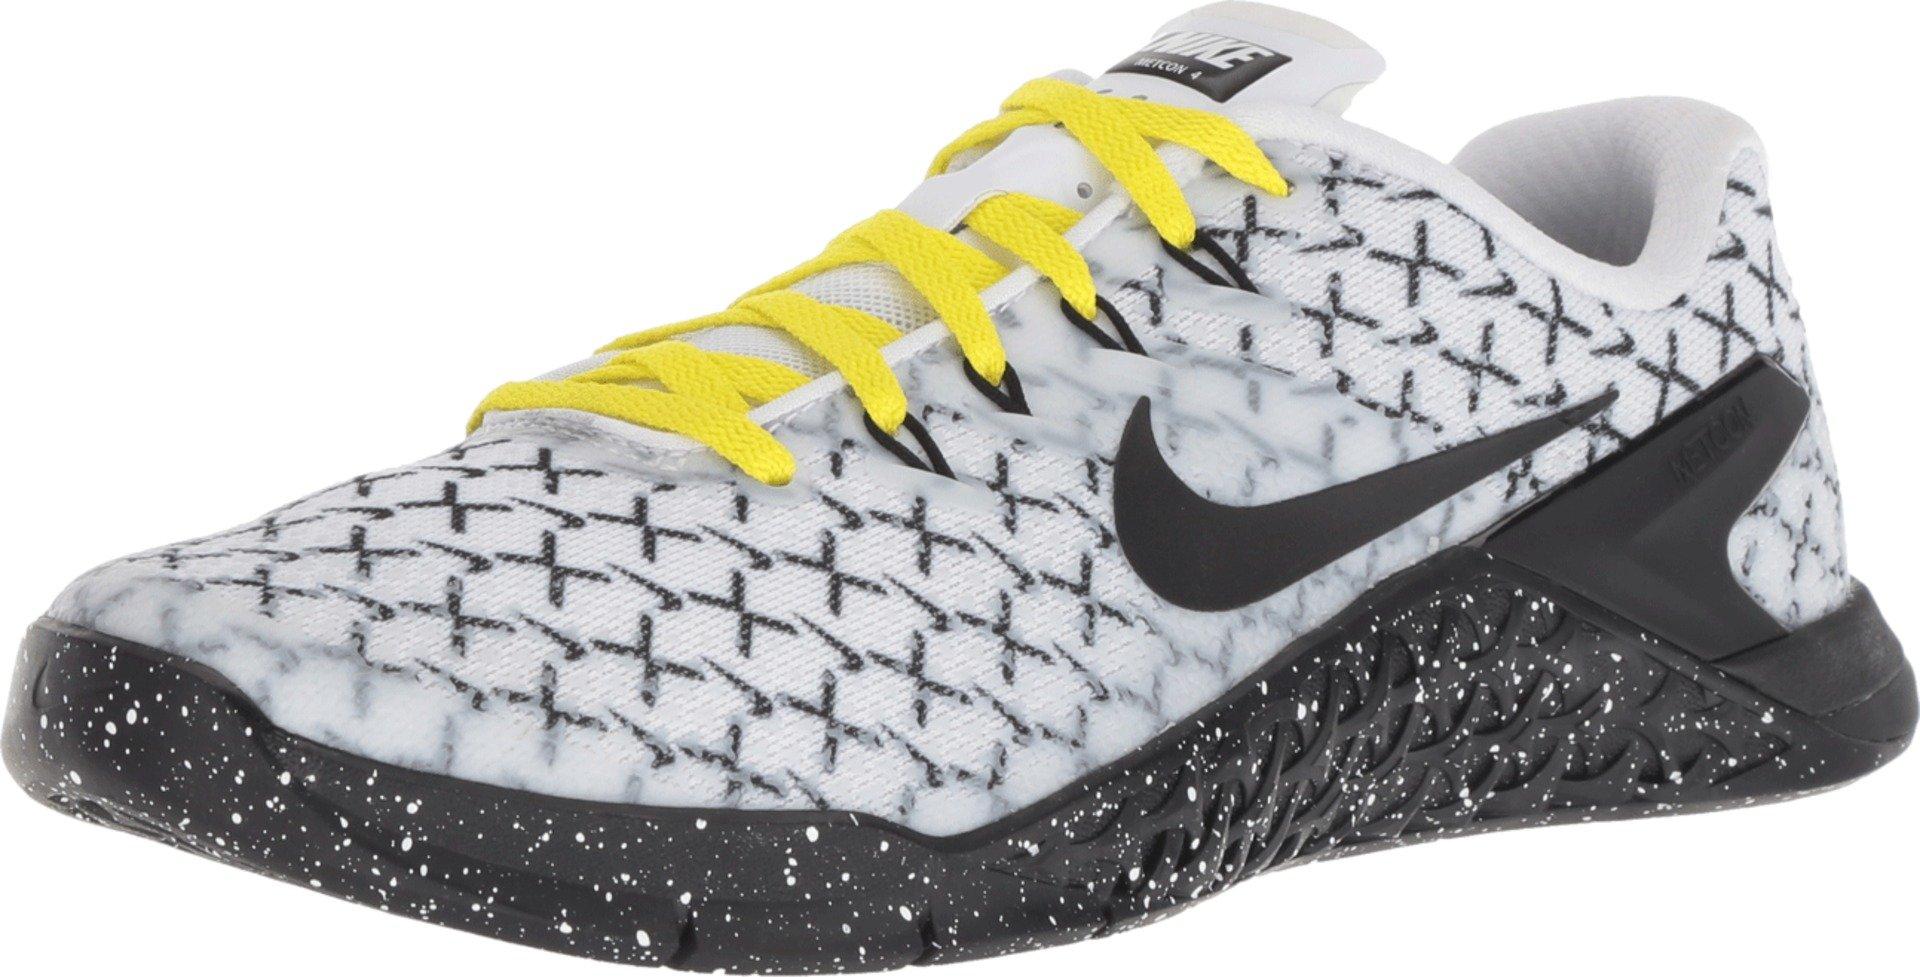 online store d69ba a6227 Galleon - Nike Women s Metcon 4 X Training Shoes (6.5, White Black Yellow)